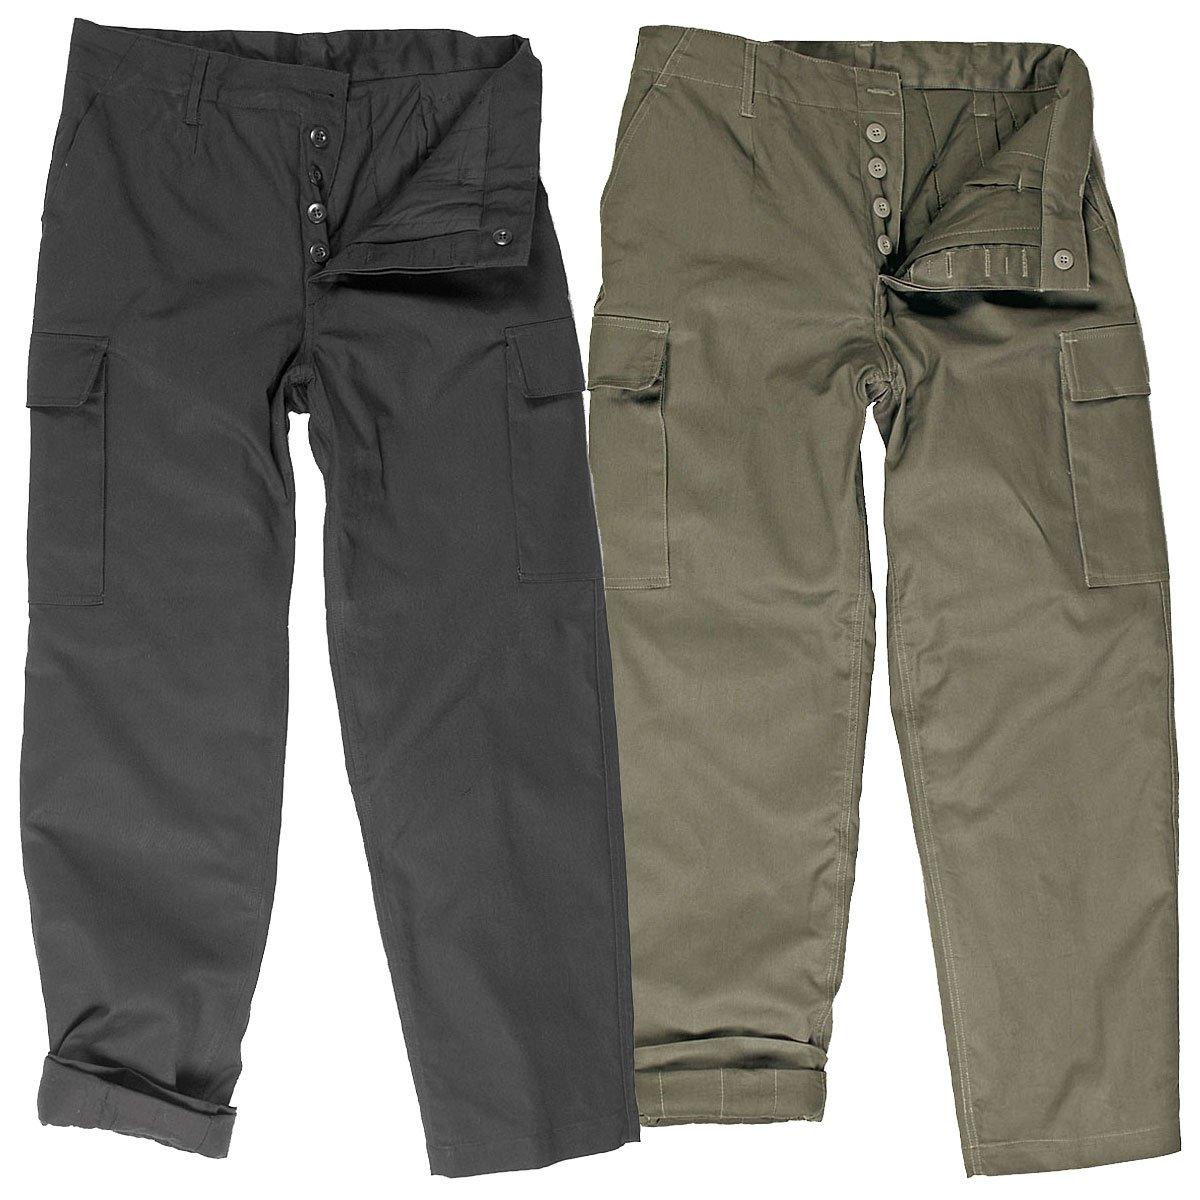 ORIGINALE esercito tedesco Leo Köhler BW termici esercito tedesco pantaloni foderati